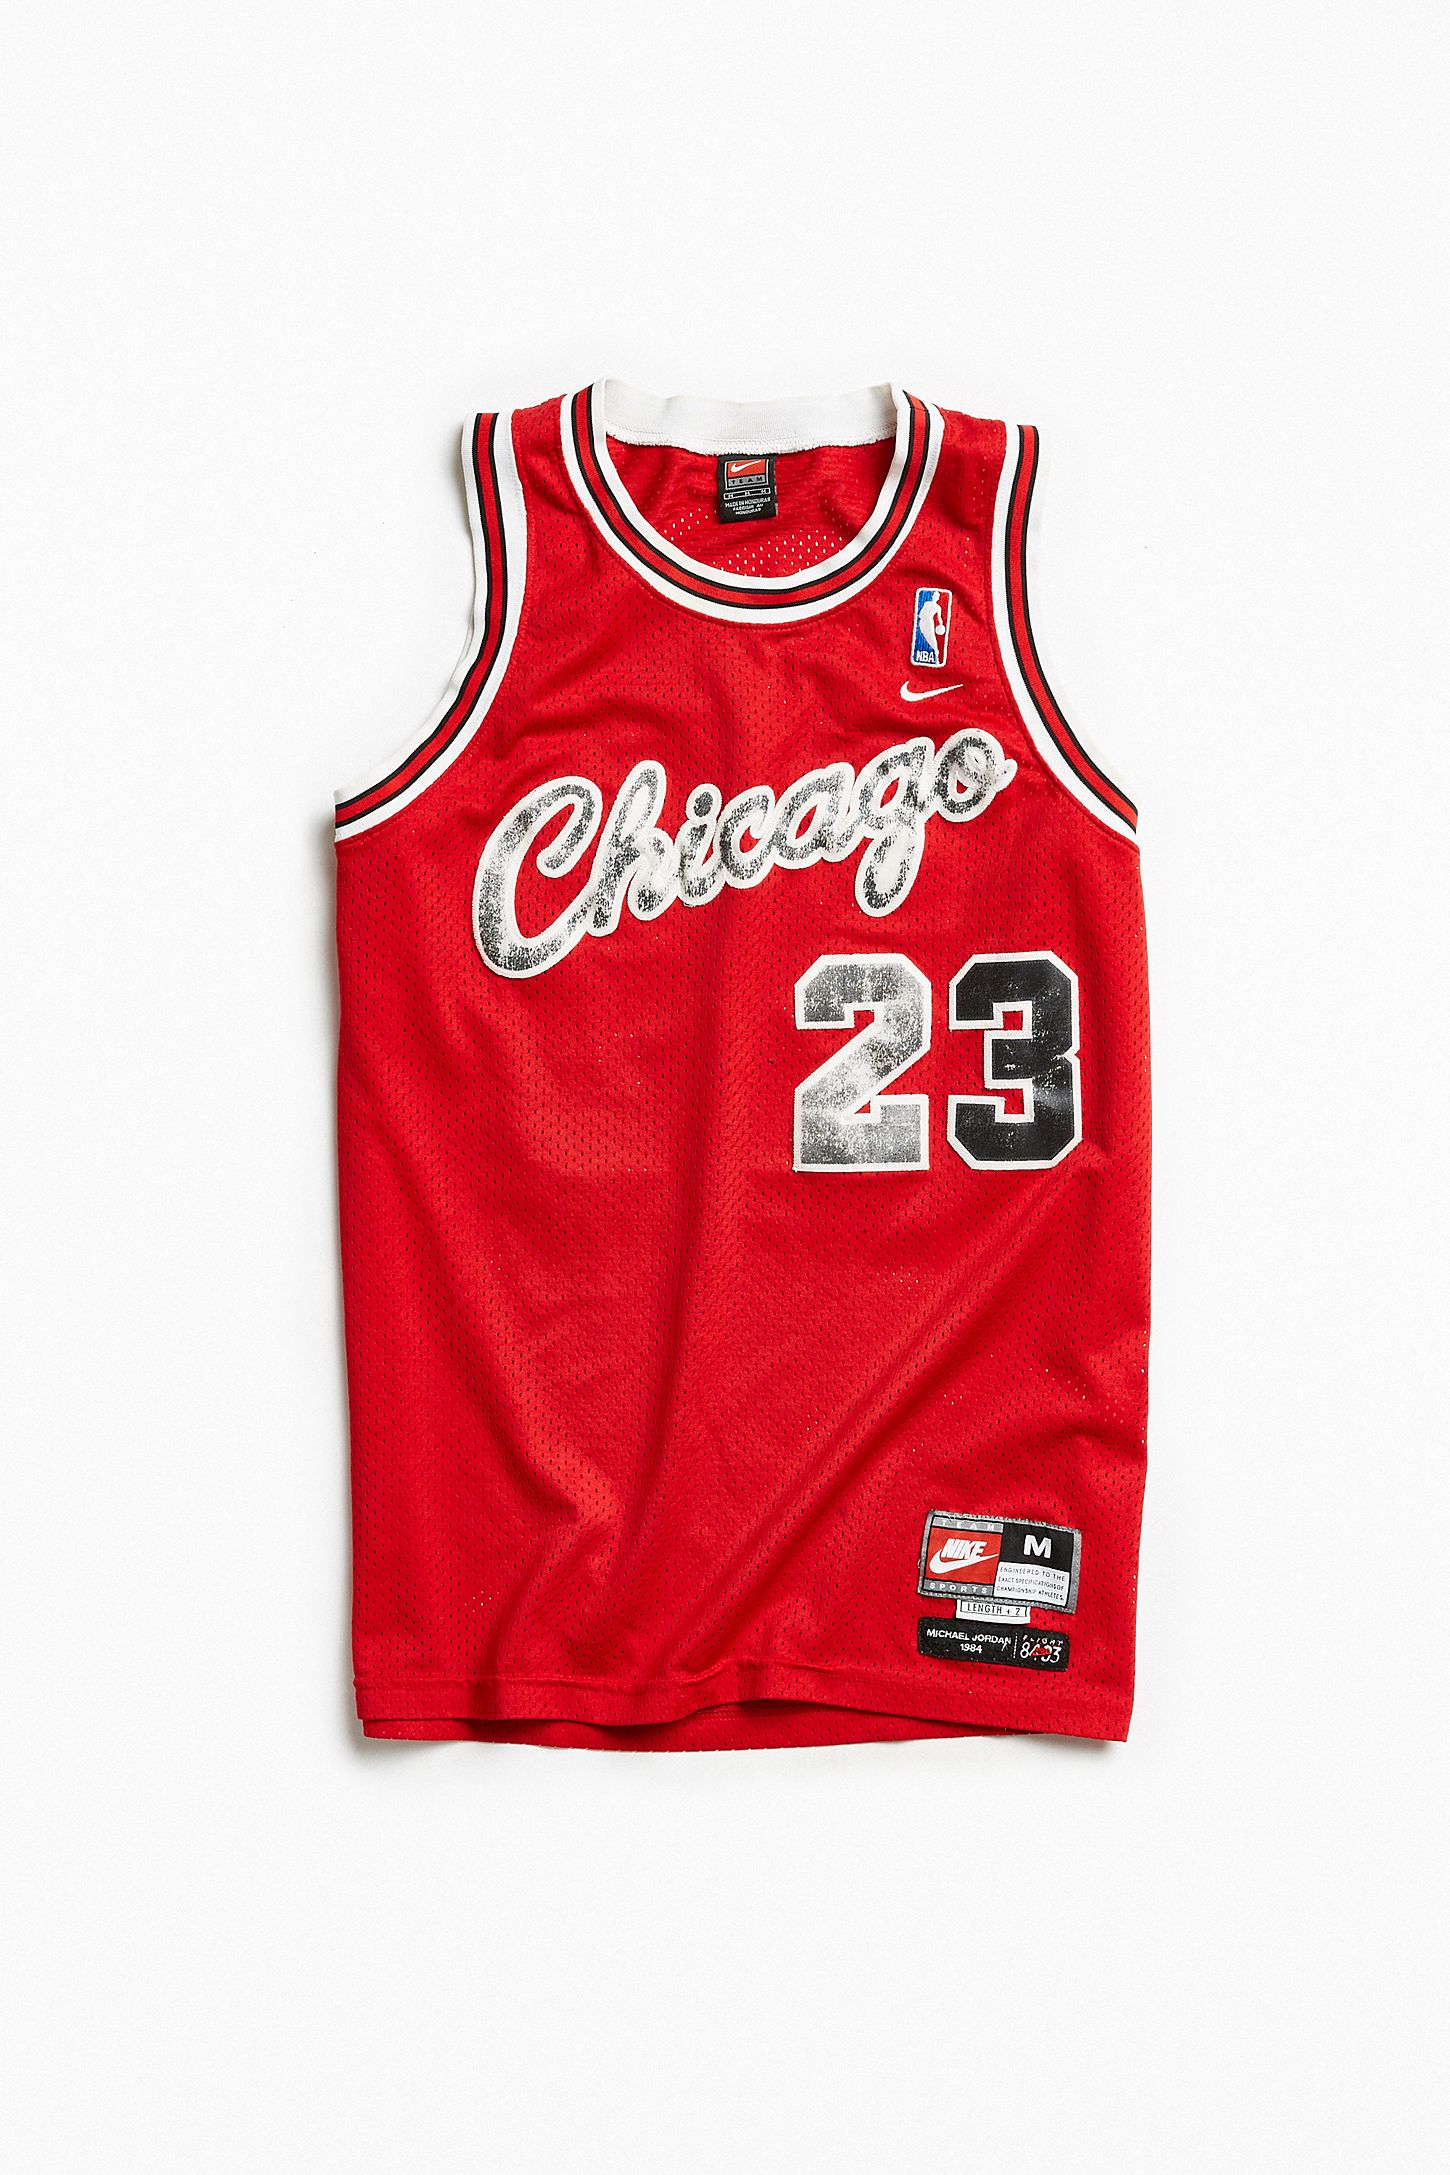 best website 5cfb4 1b122 Vintage Michael Jordan Bulls Jersey | Urban Outfitters Canada